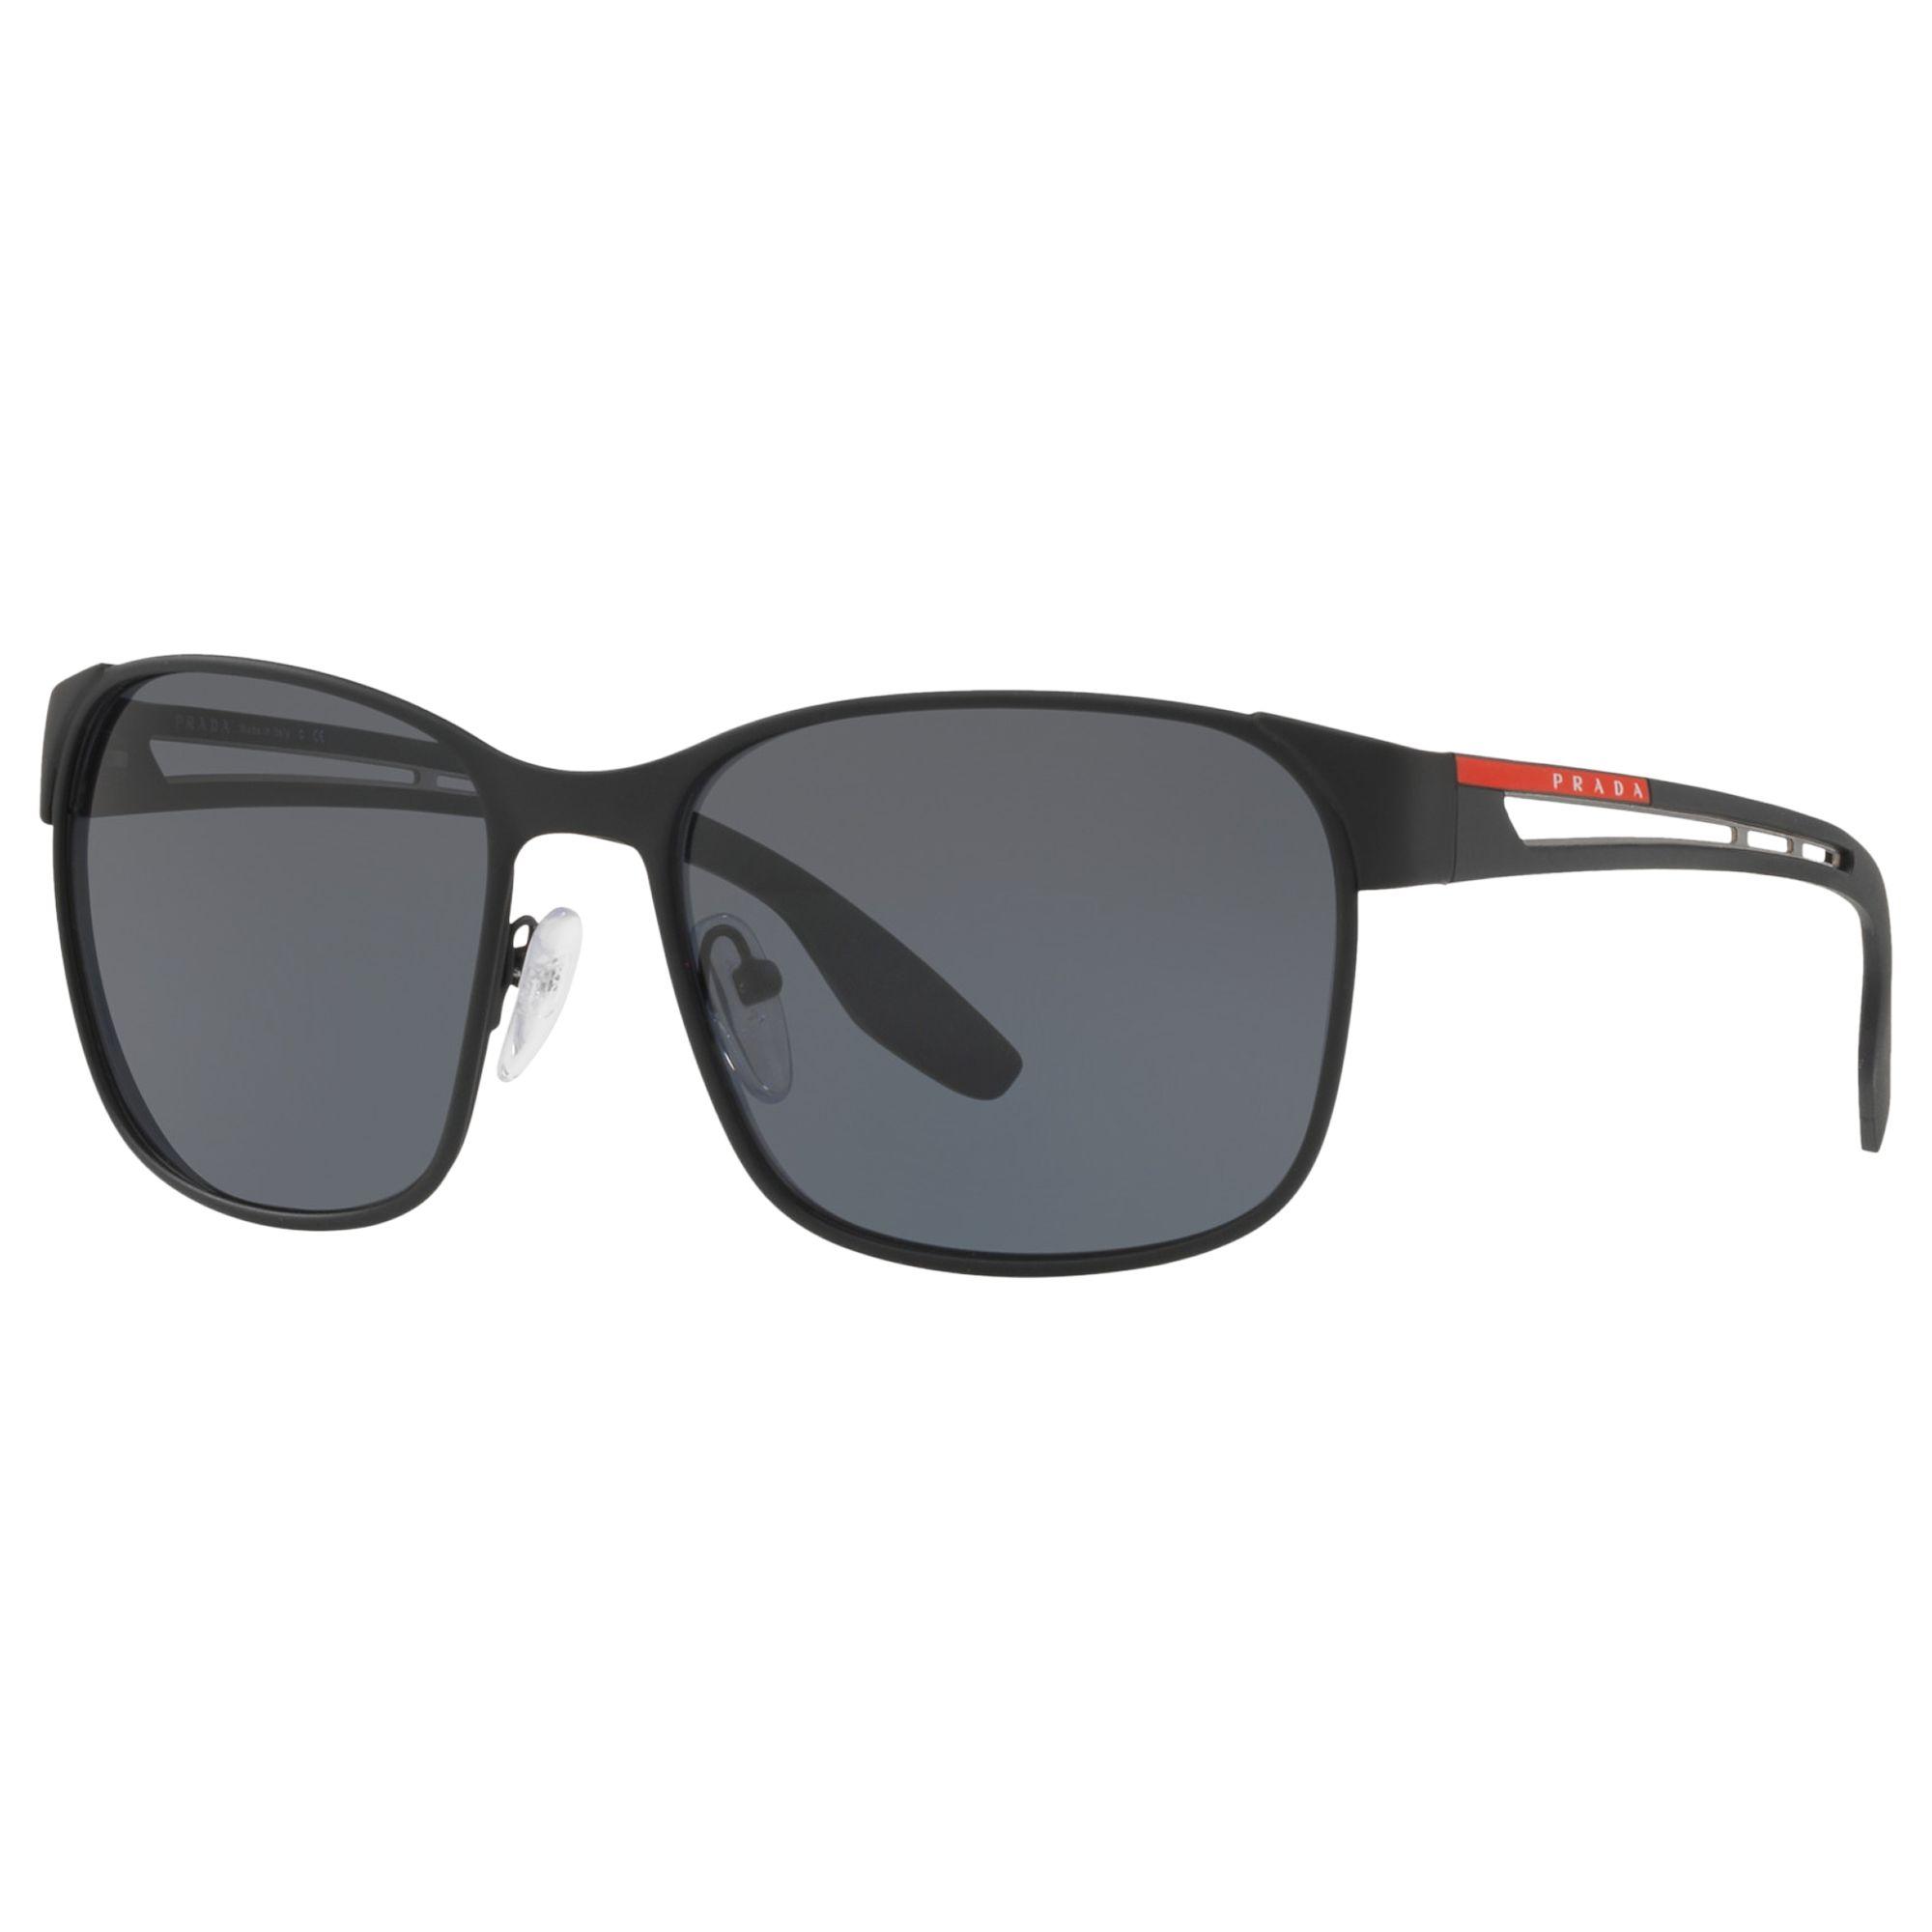 c0ce6127059e Prada Linea Rossa PS 52TS Men s Square Sunglasses